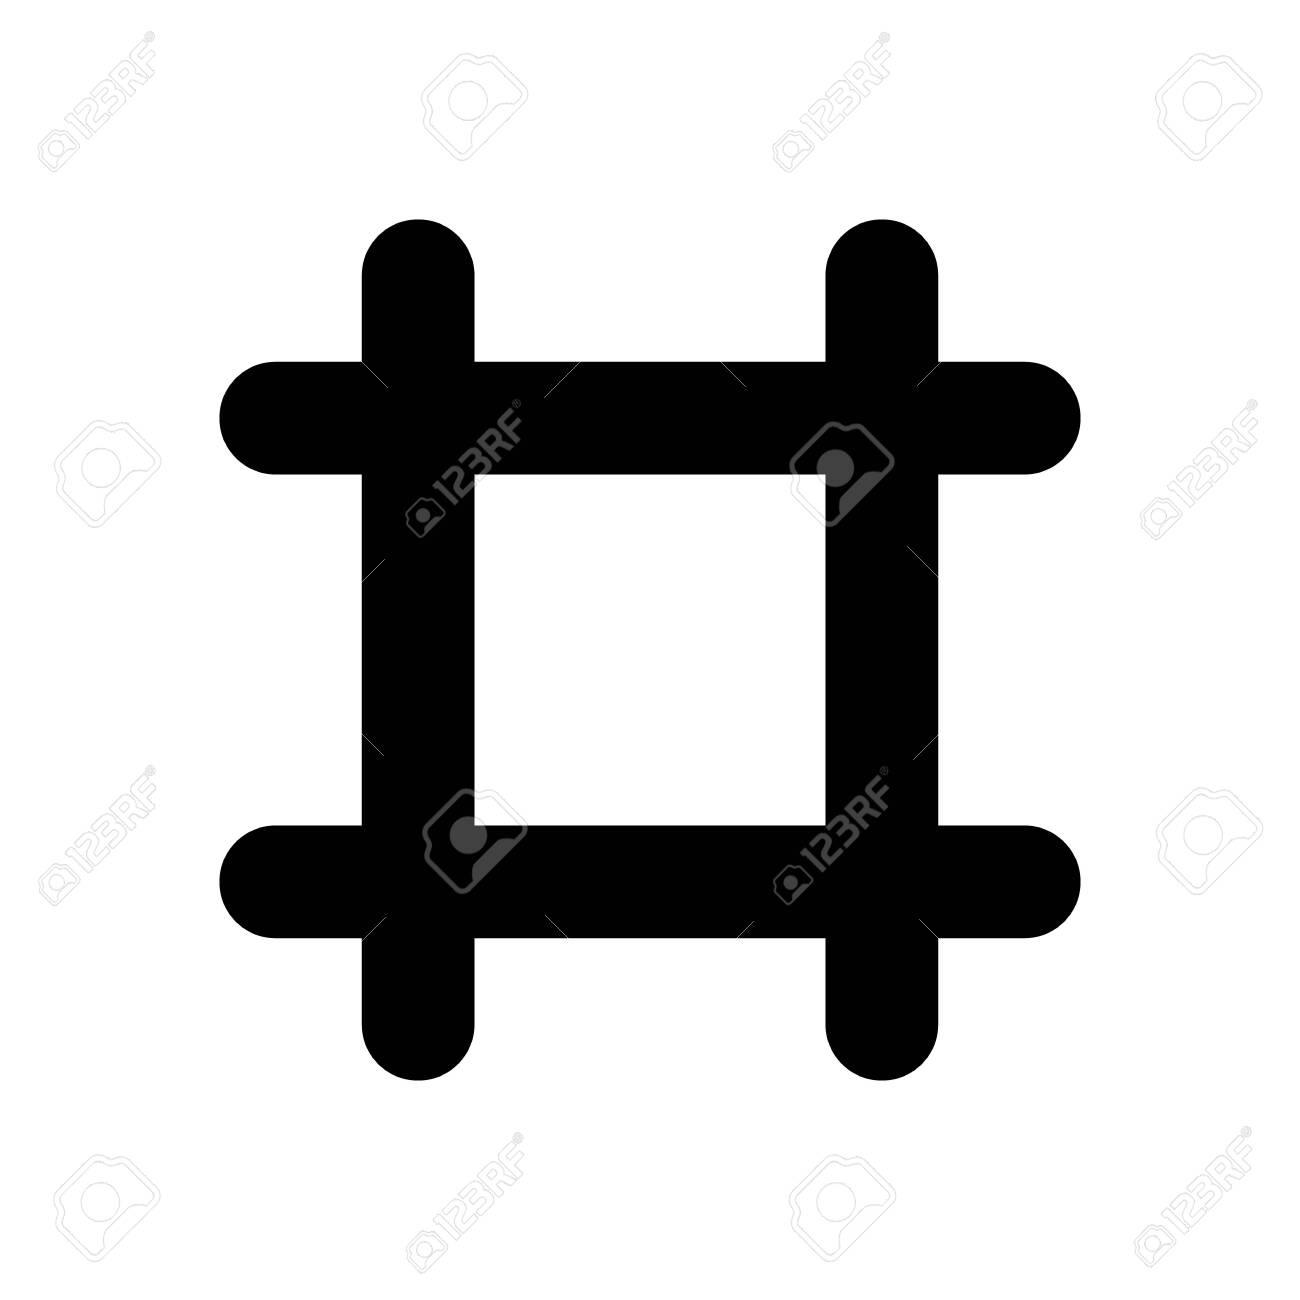 Prison. vector Simple modern icon design illustration. - 144324275